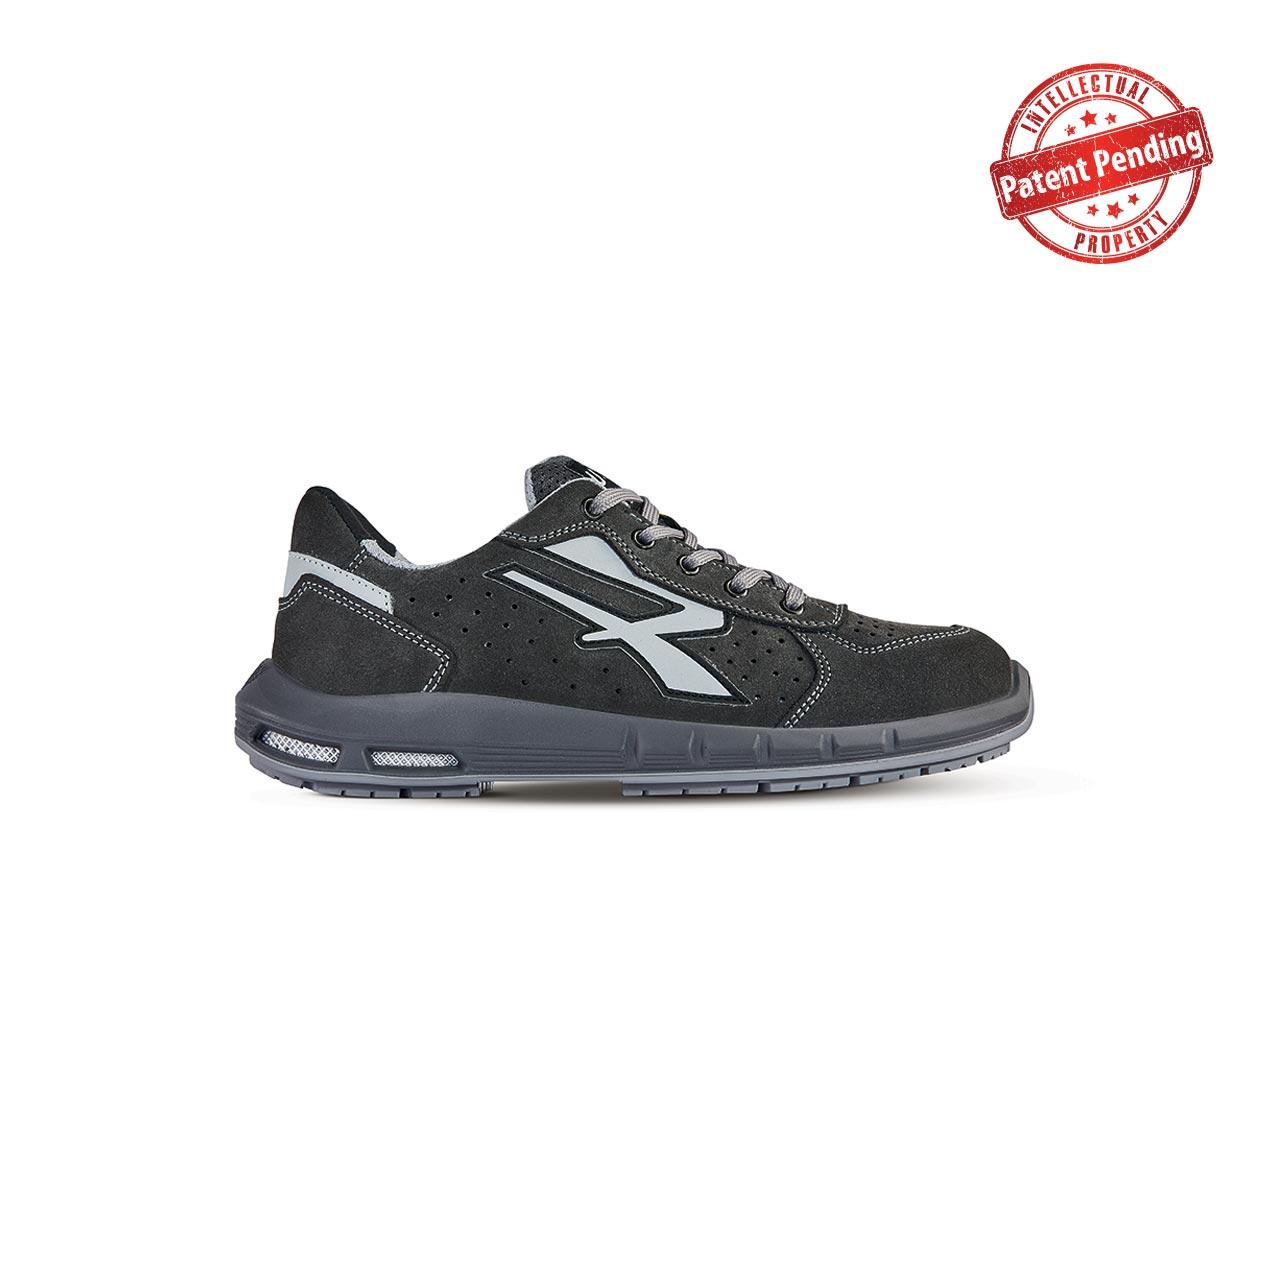 scarpa antinfortunistica upower modello rigel plus linea redup plus vista laterale